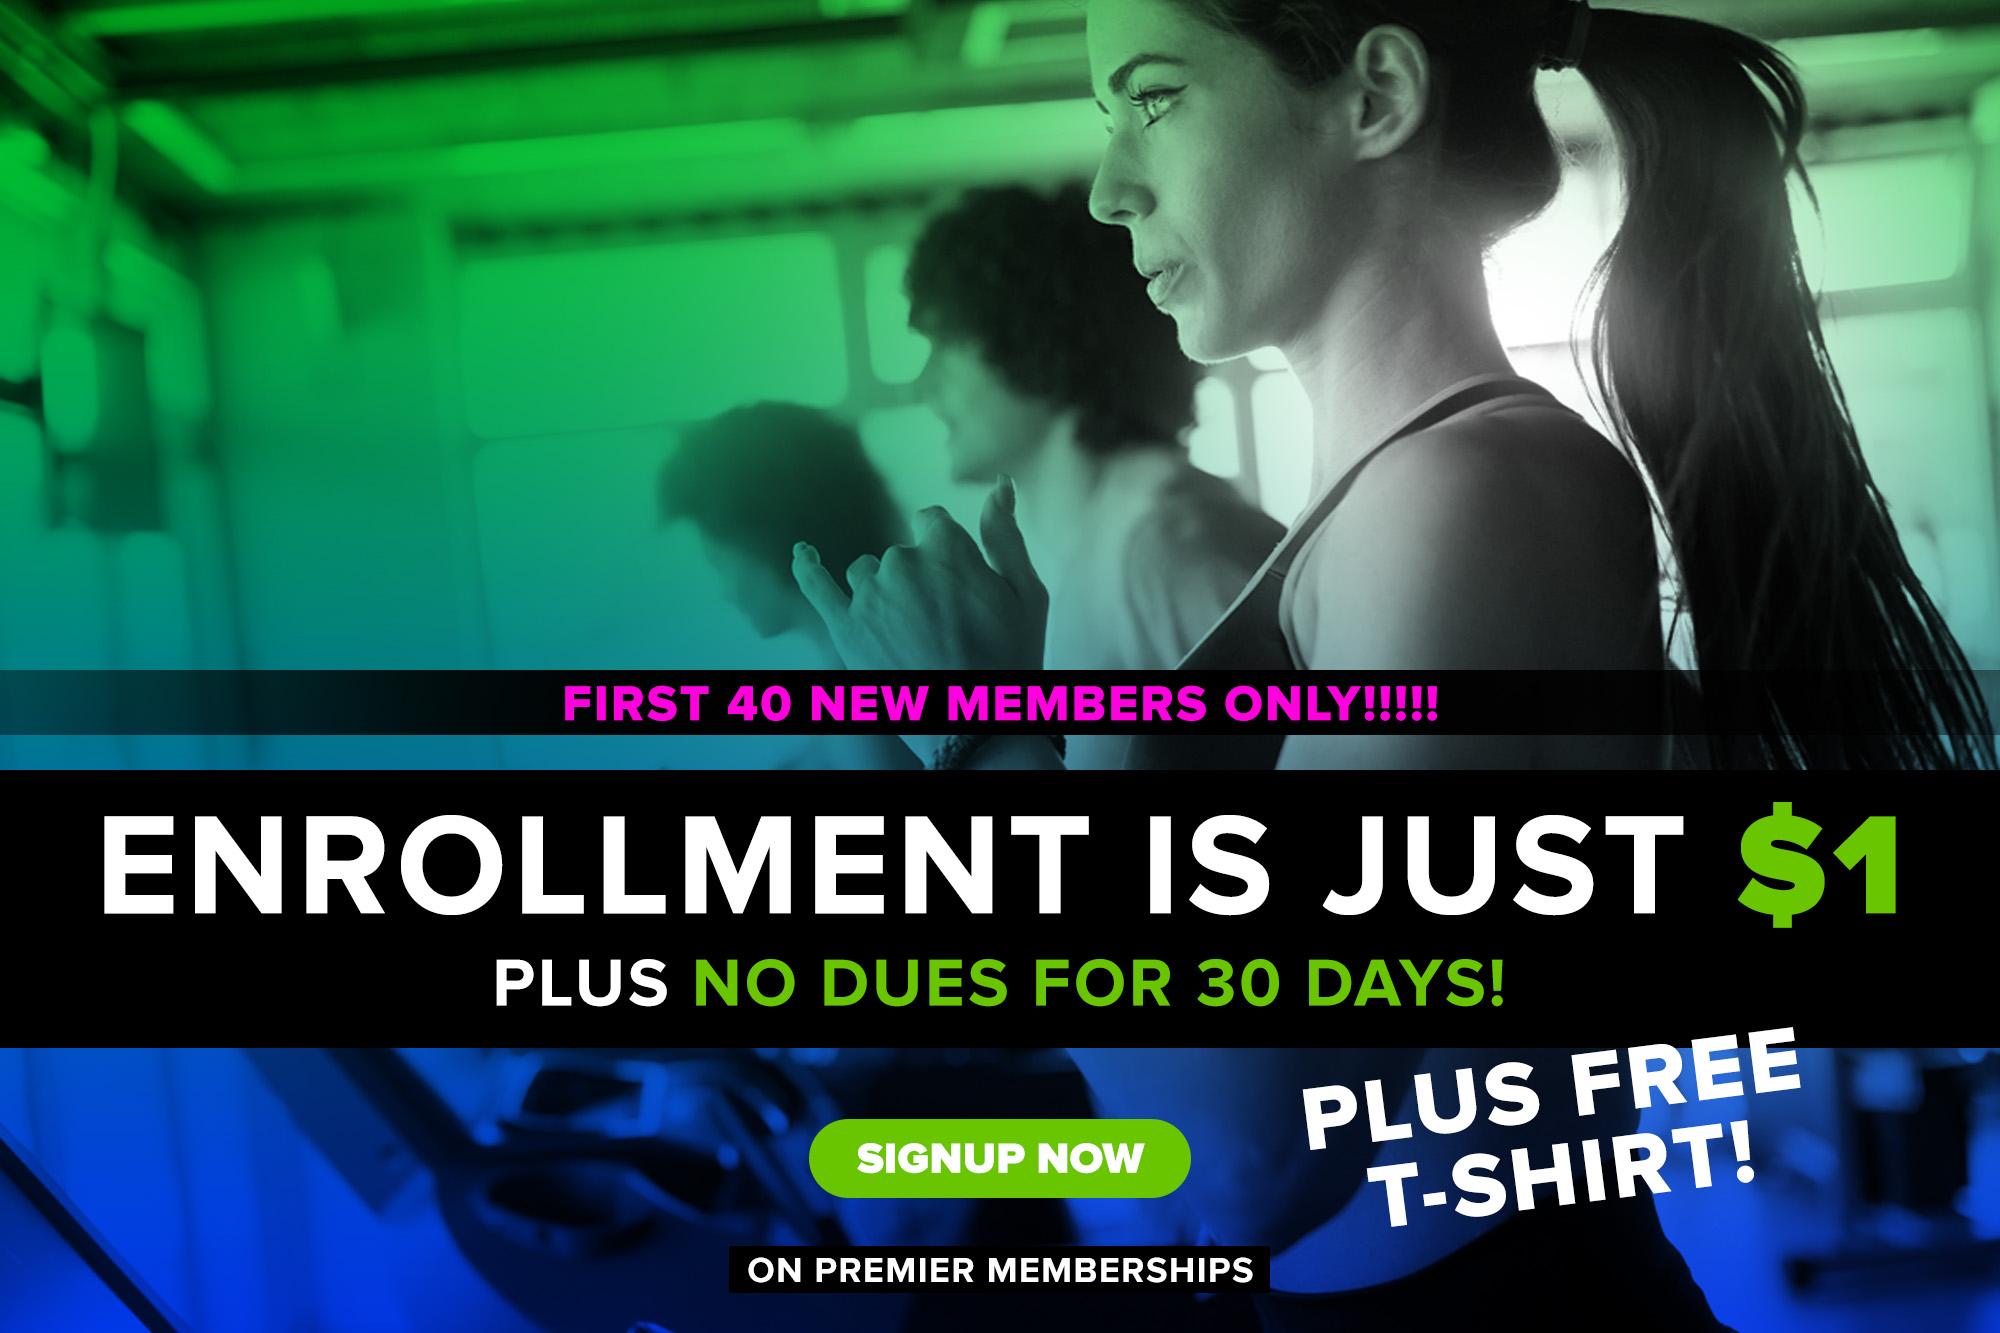 $1 Enrollment - 30 Days